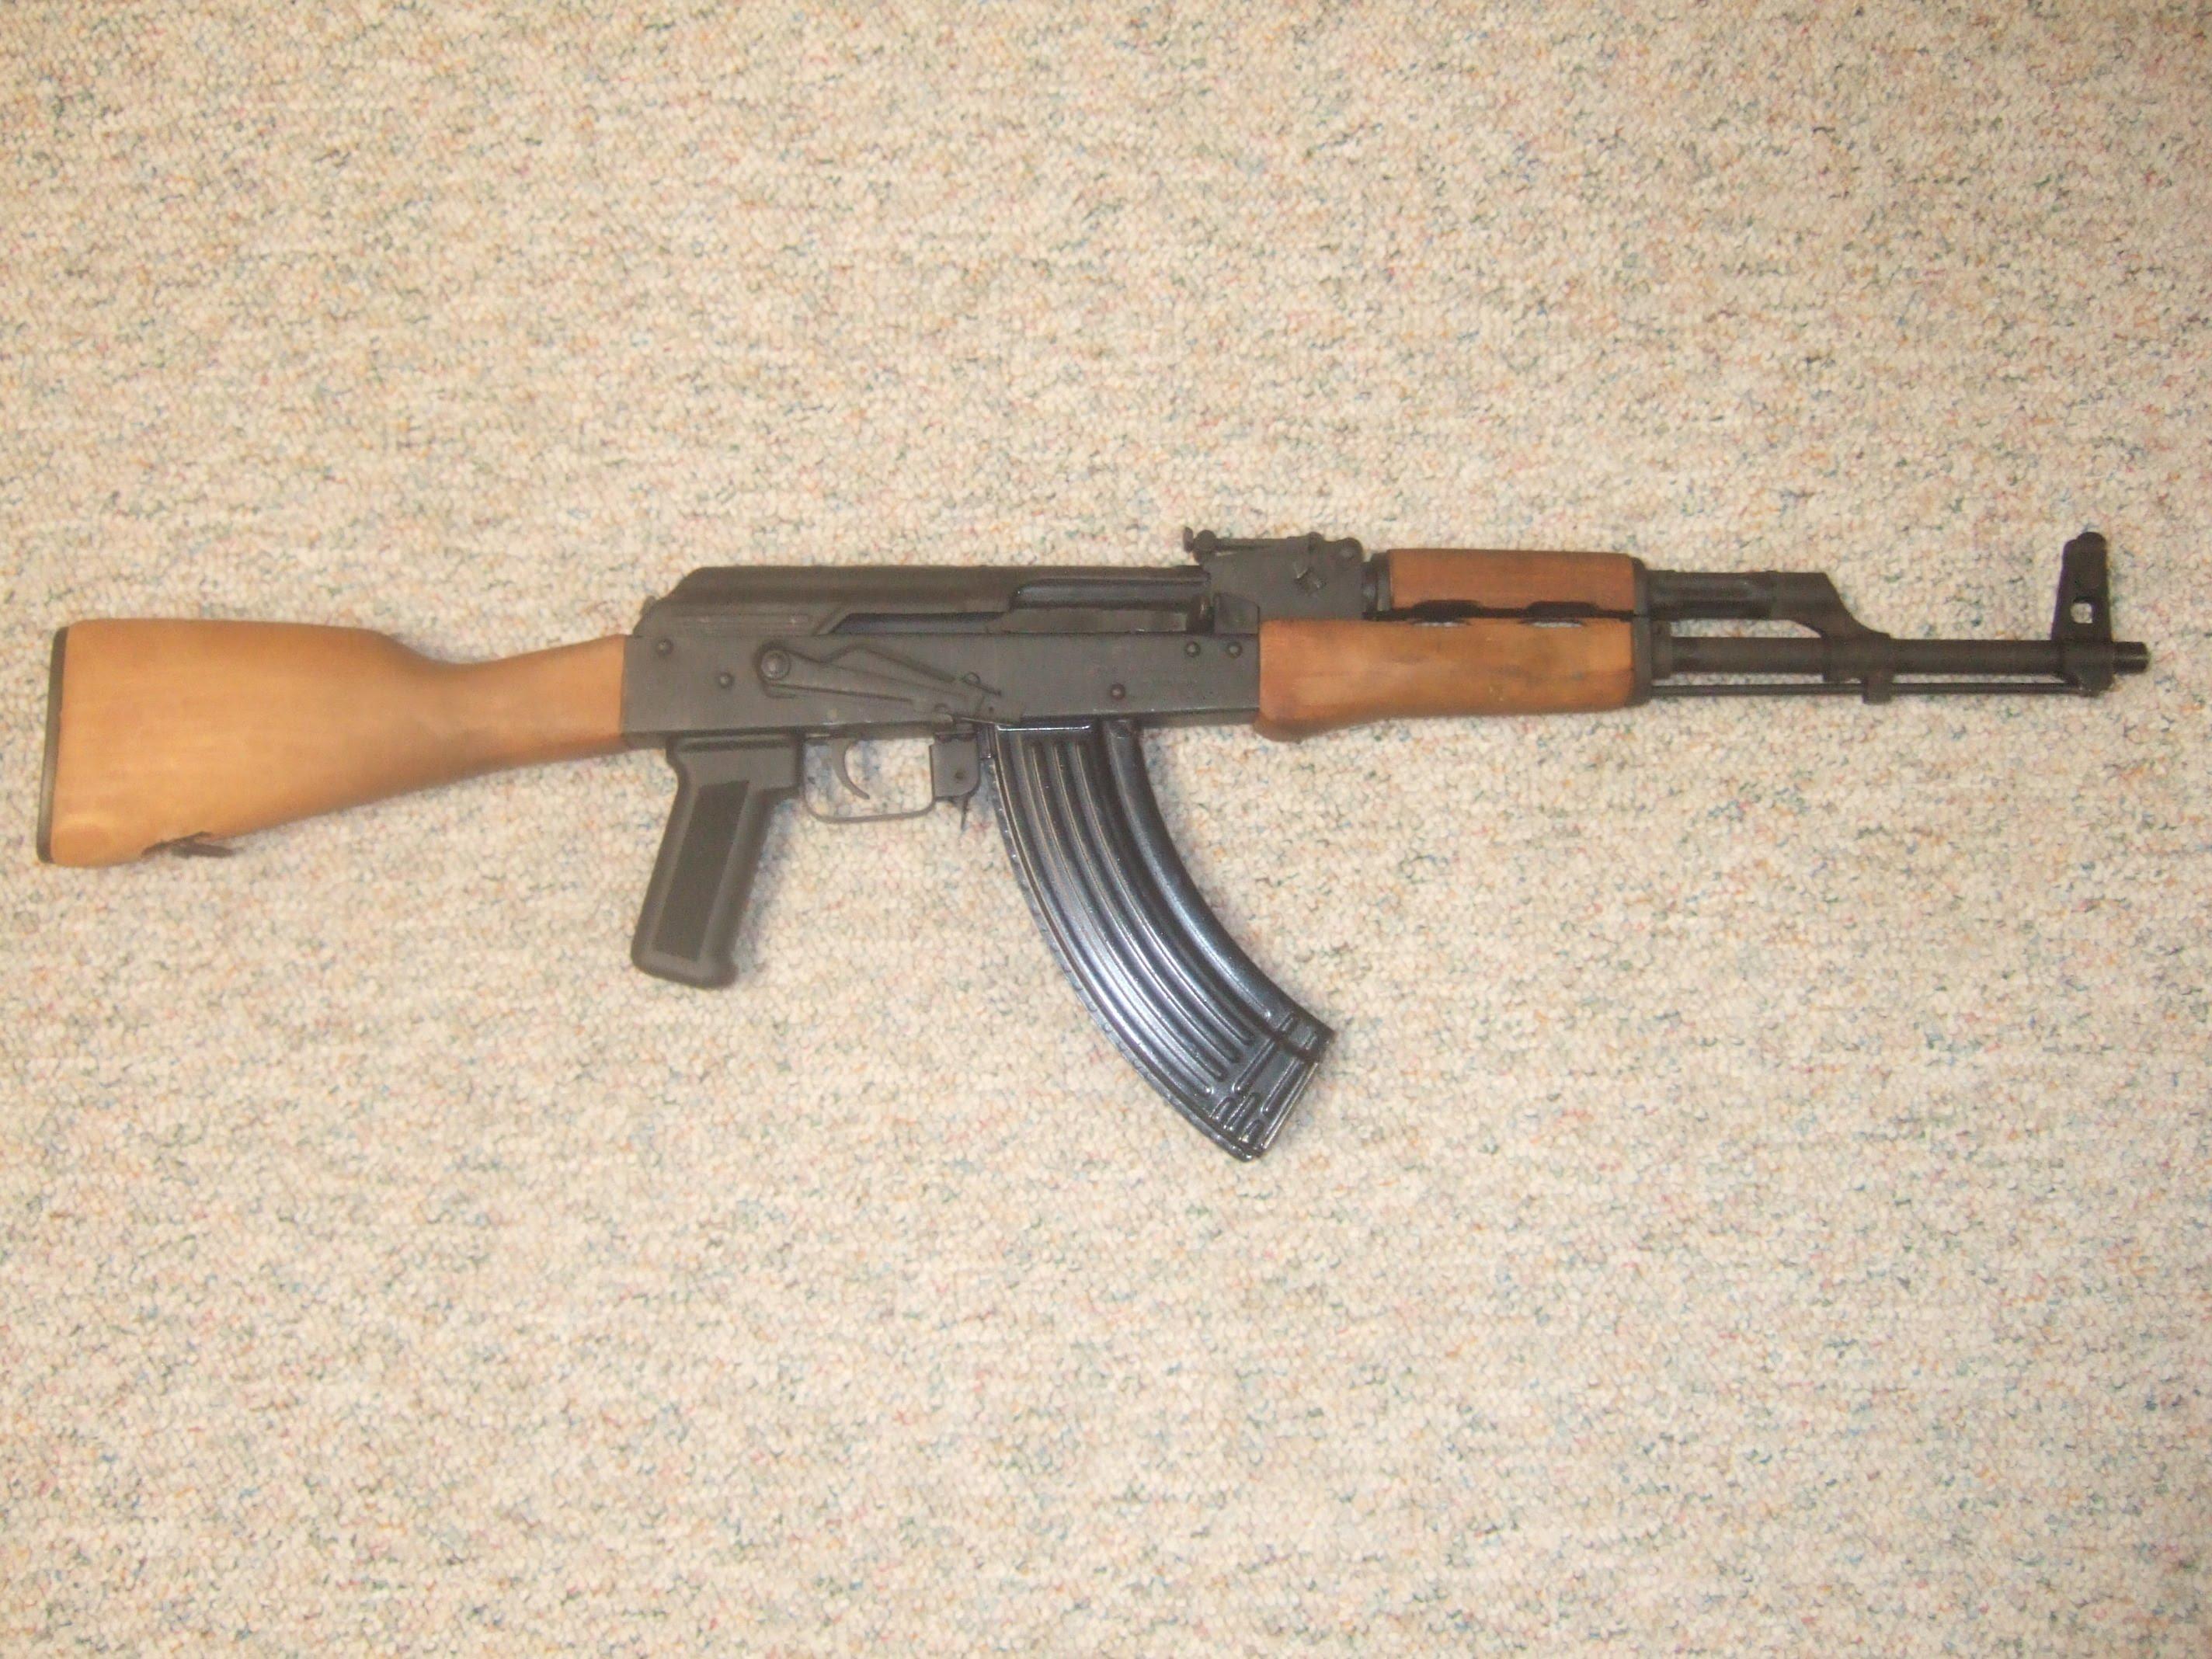 WASR 10 AK-47